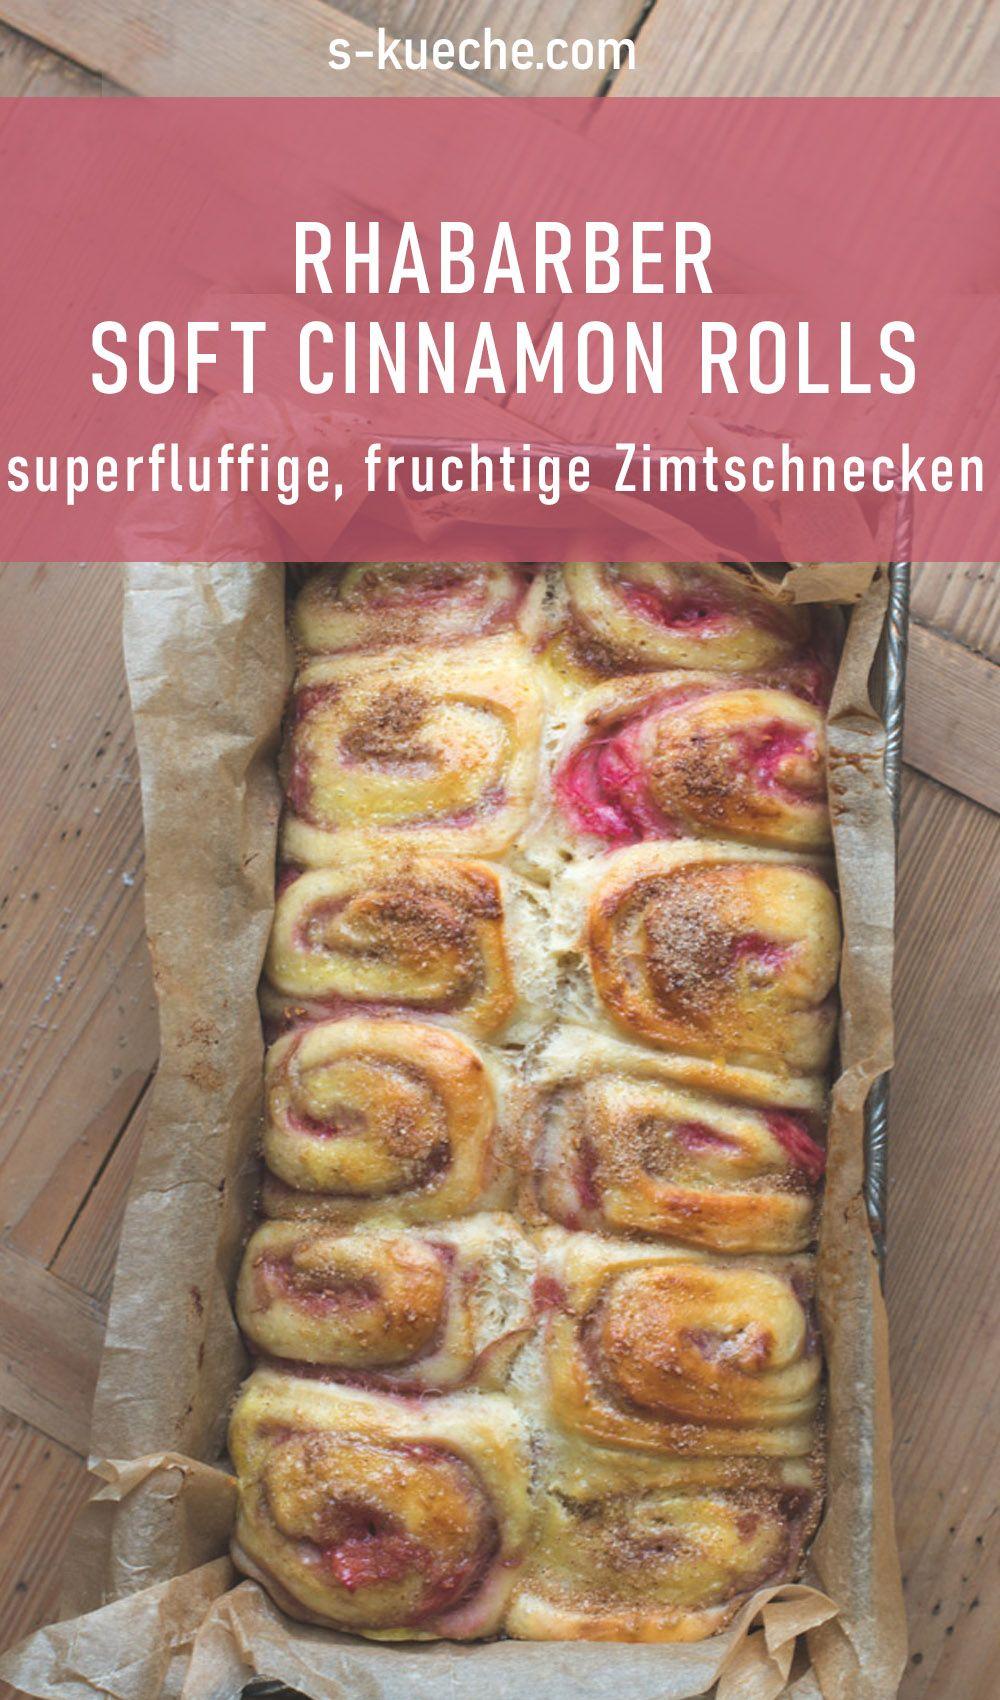 Photo of Soft cinnamon rolls with rhubarb